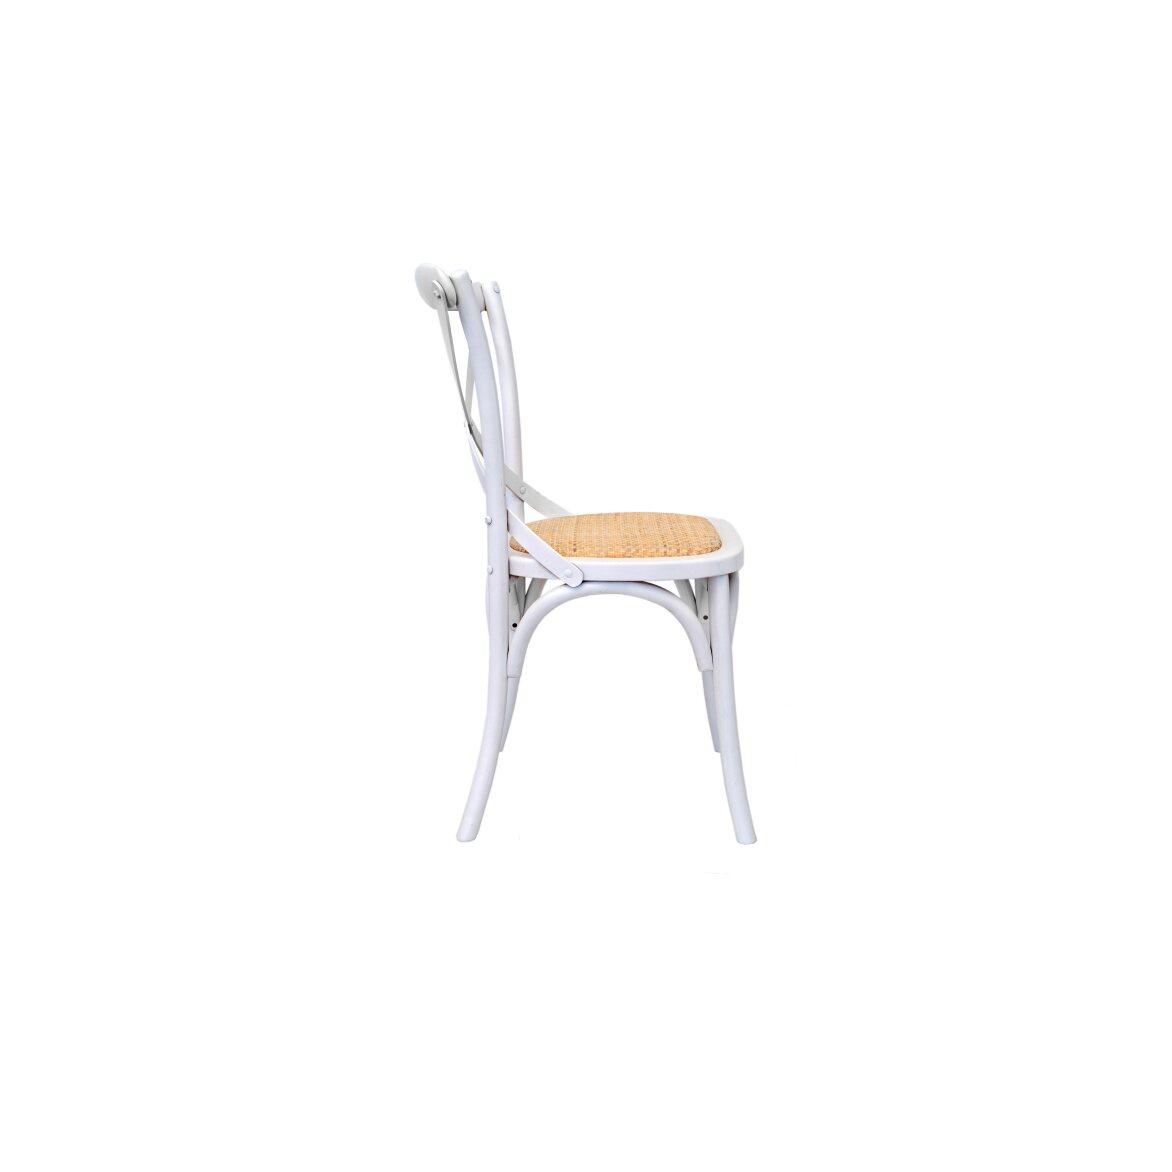 Стул Cross back white 2 | Обеденные стулья Kingsby